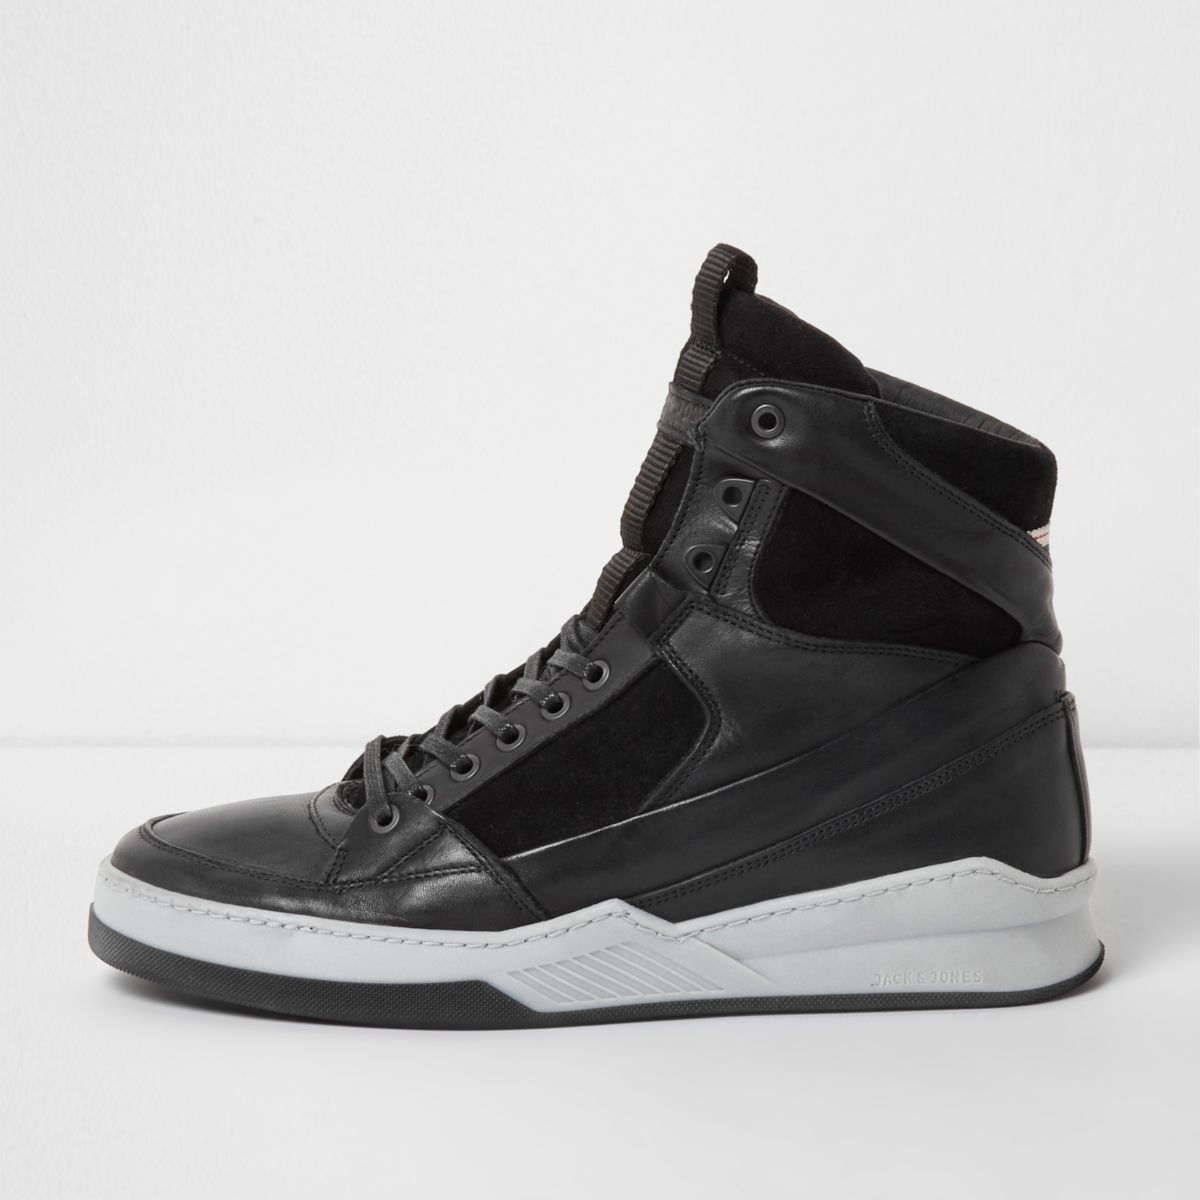 Black Jack & Jones hi top leather sneakers